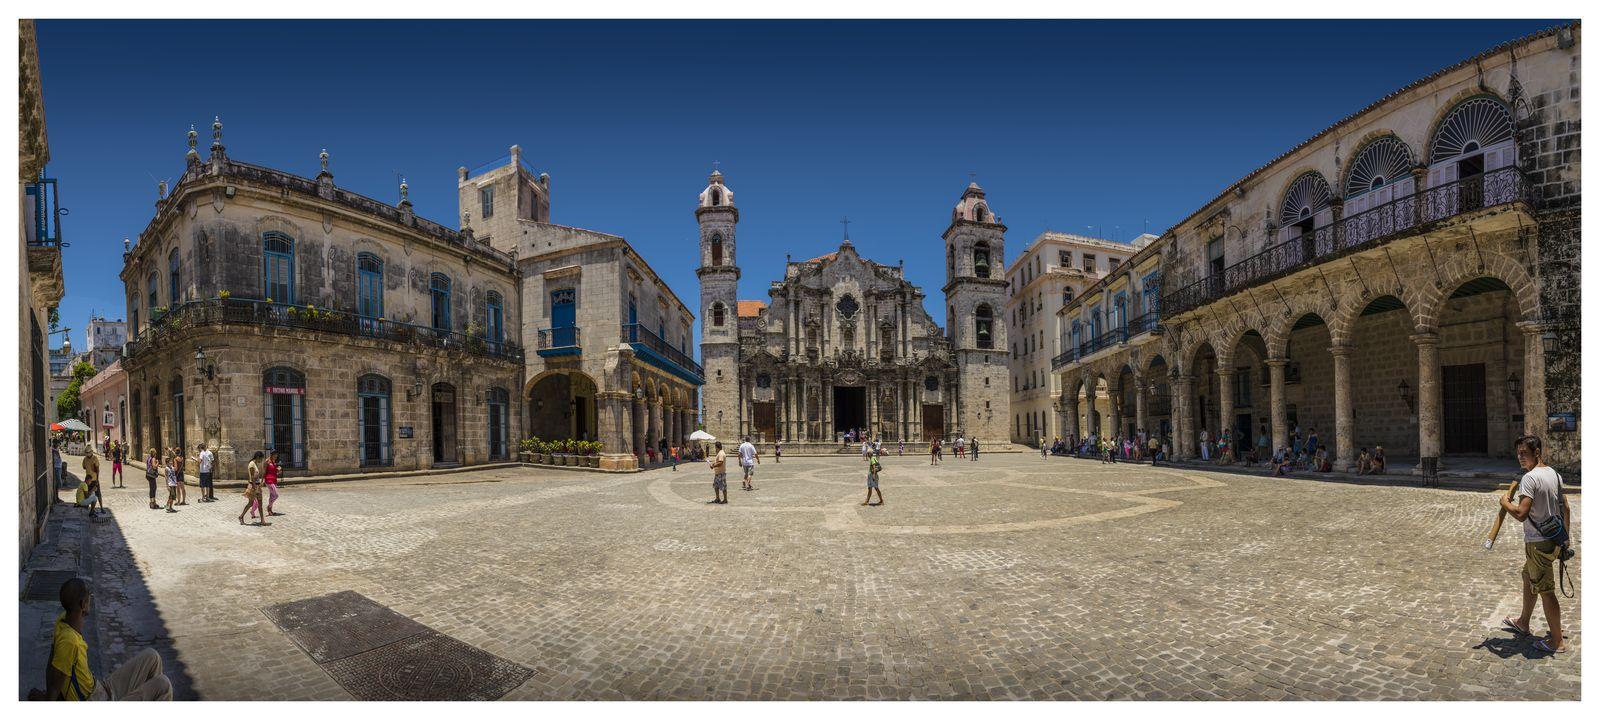 Panorama - Catedral de La Habana [1600x1200]